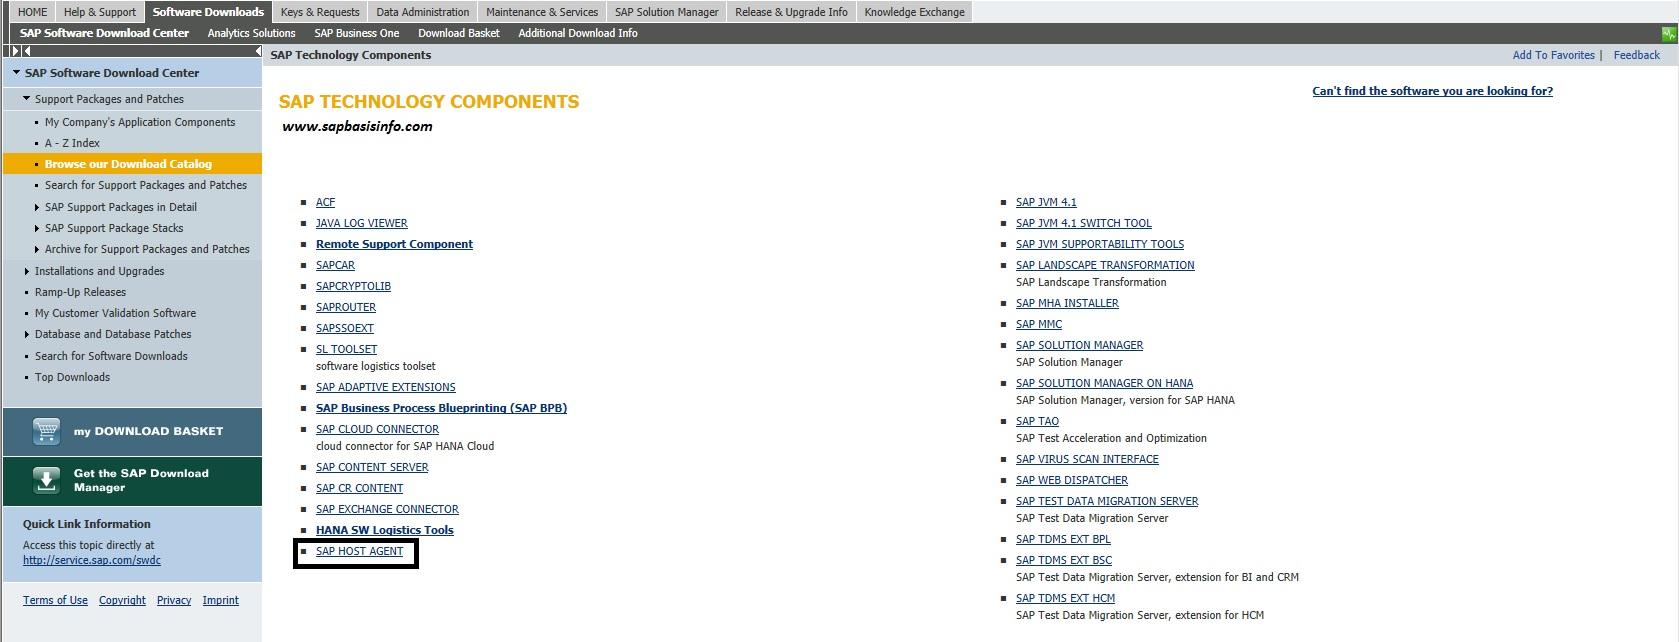 Install SAP Host Agent